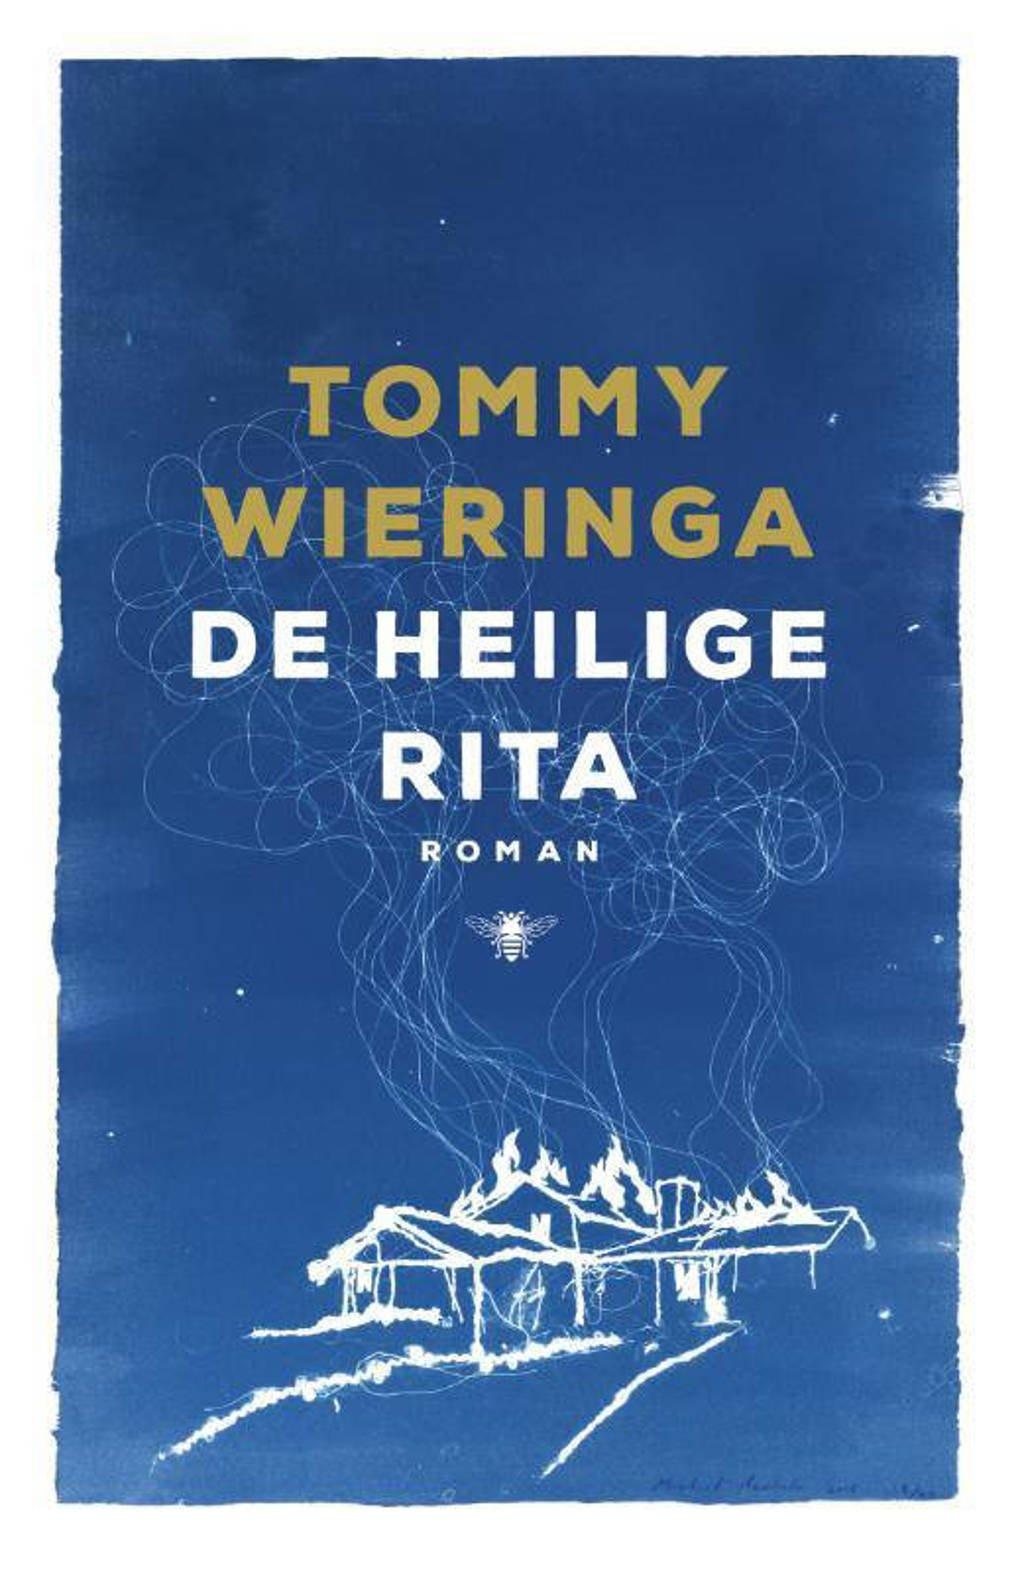 De heilige Rita - Tommy Wieringa